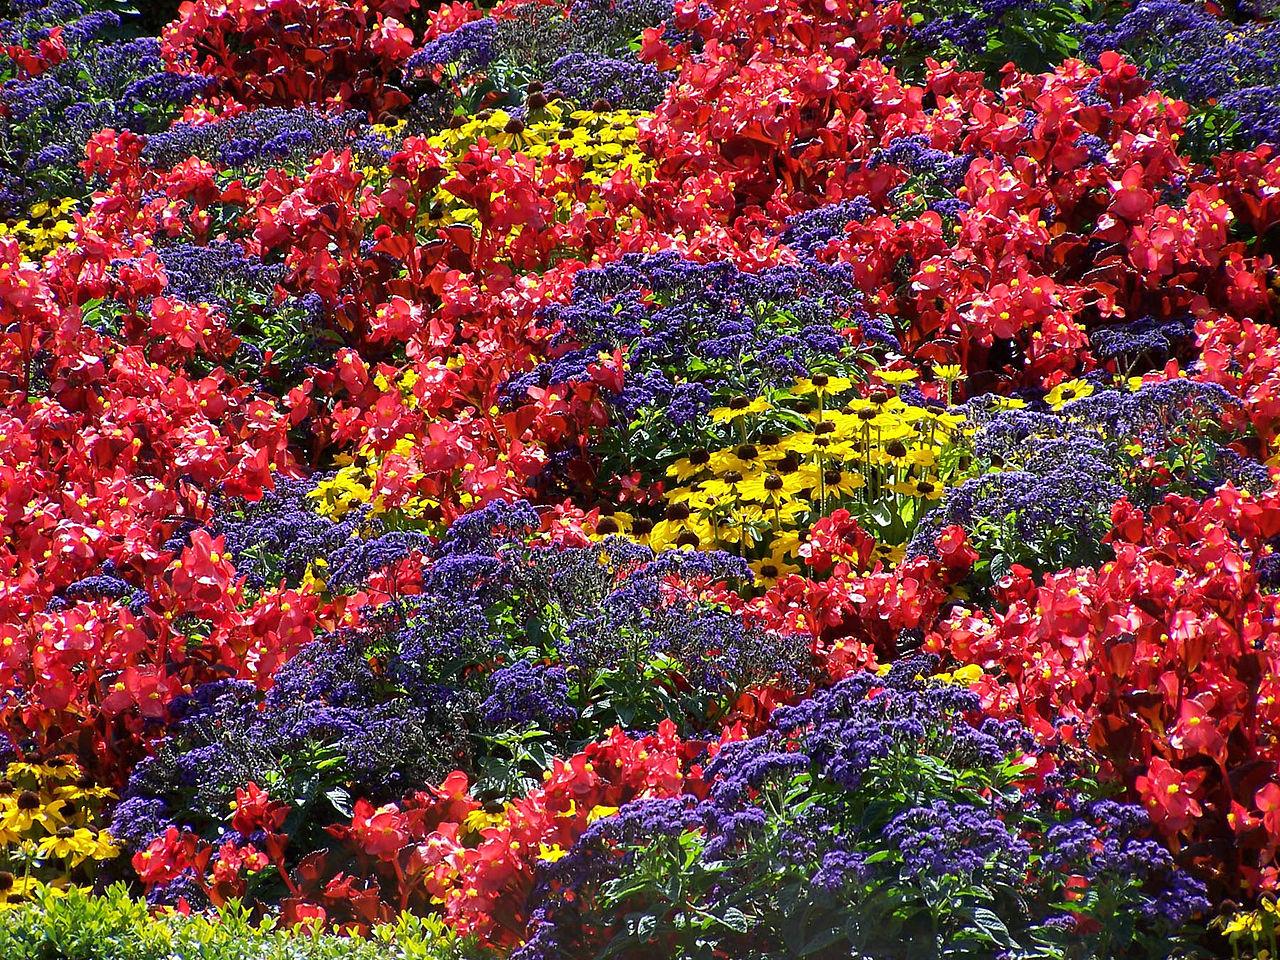 File:FlowerBed.jpg - Wikimedia Commons